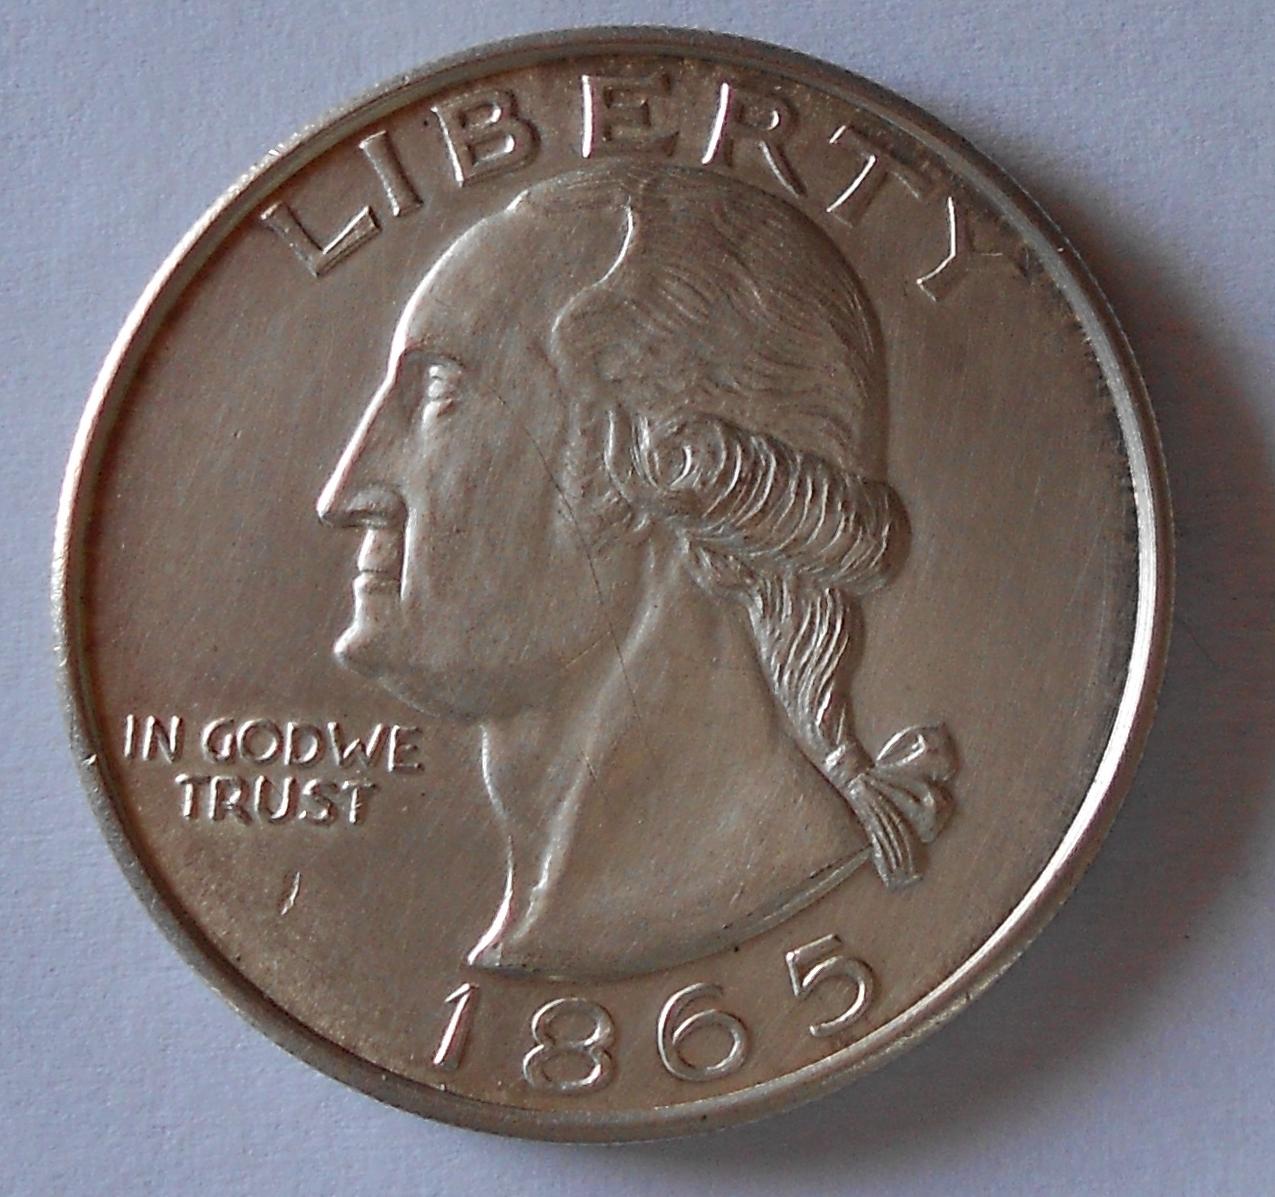 USA 1 Dolar 1865 kopie